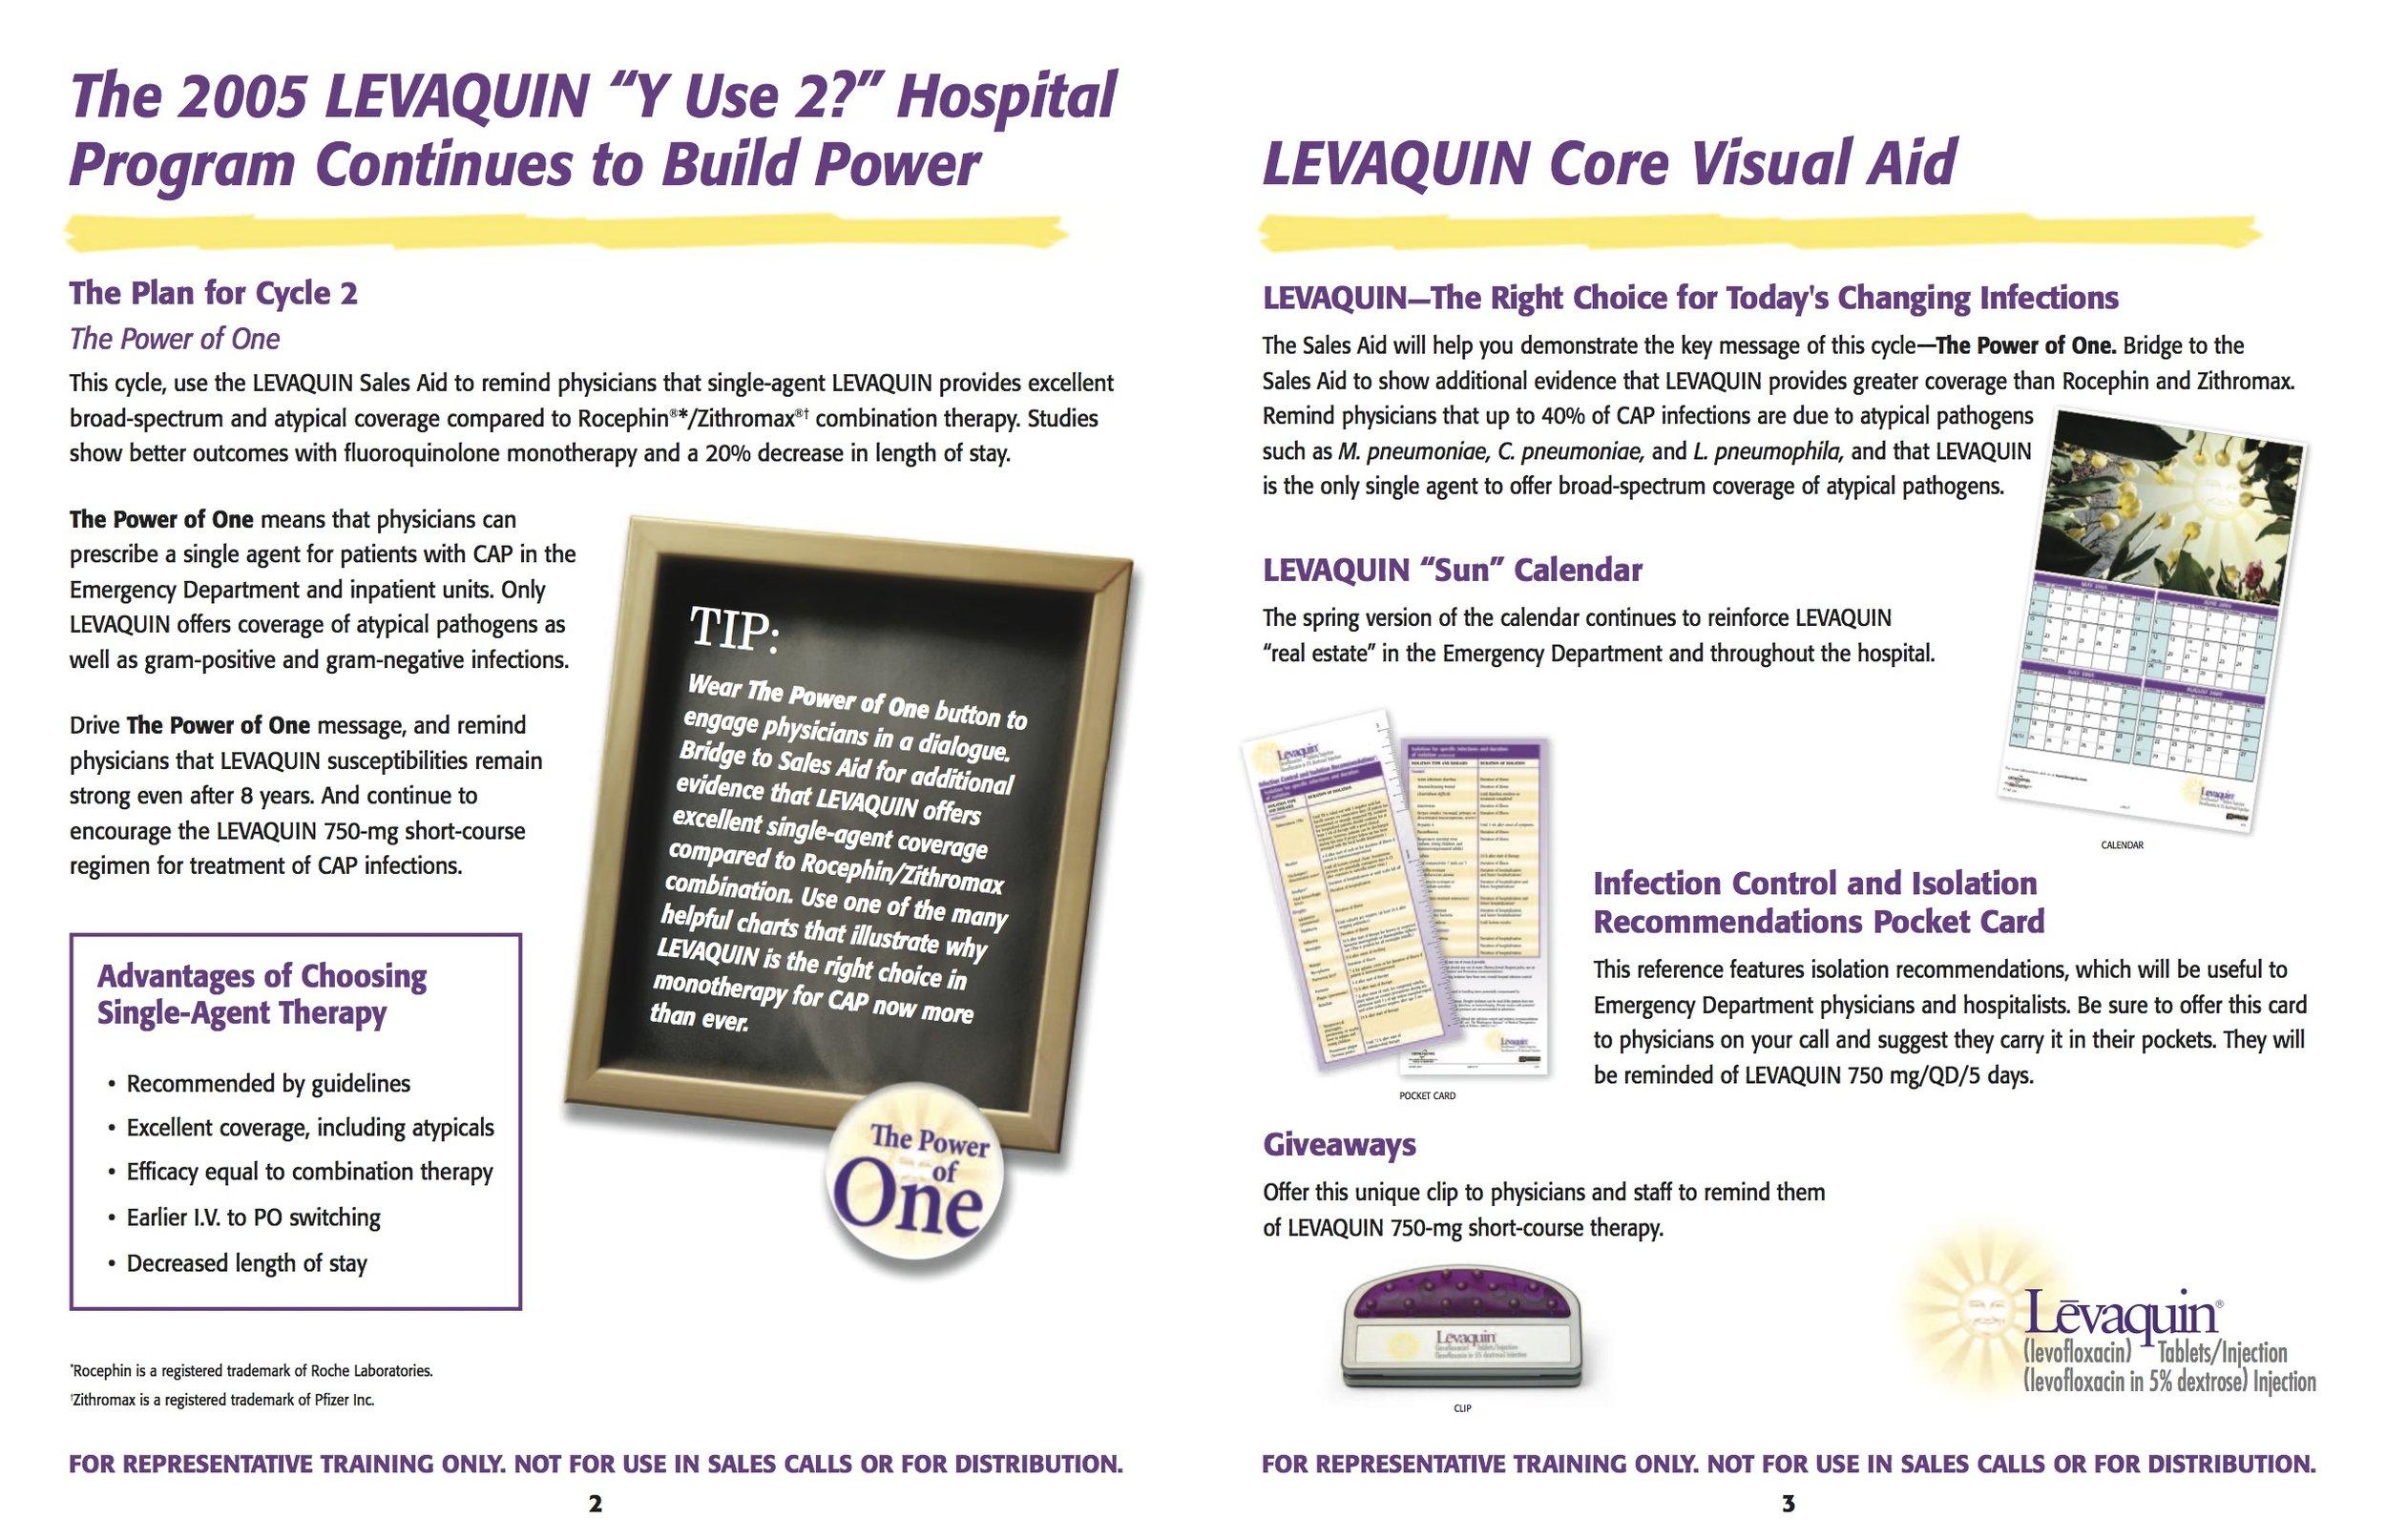 Levaquin-User-Guide-p2.jpg